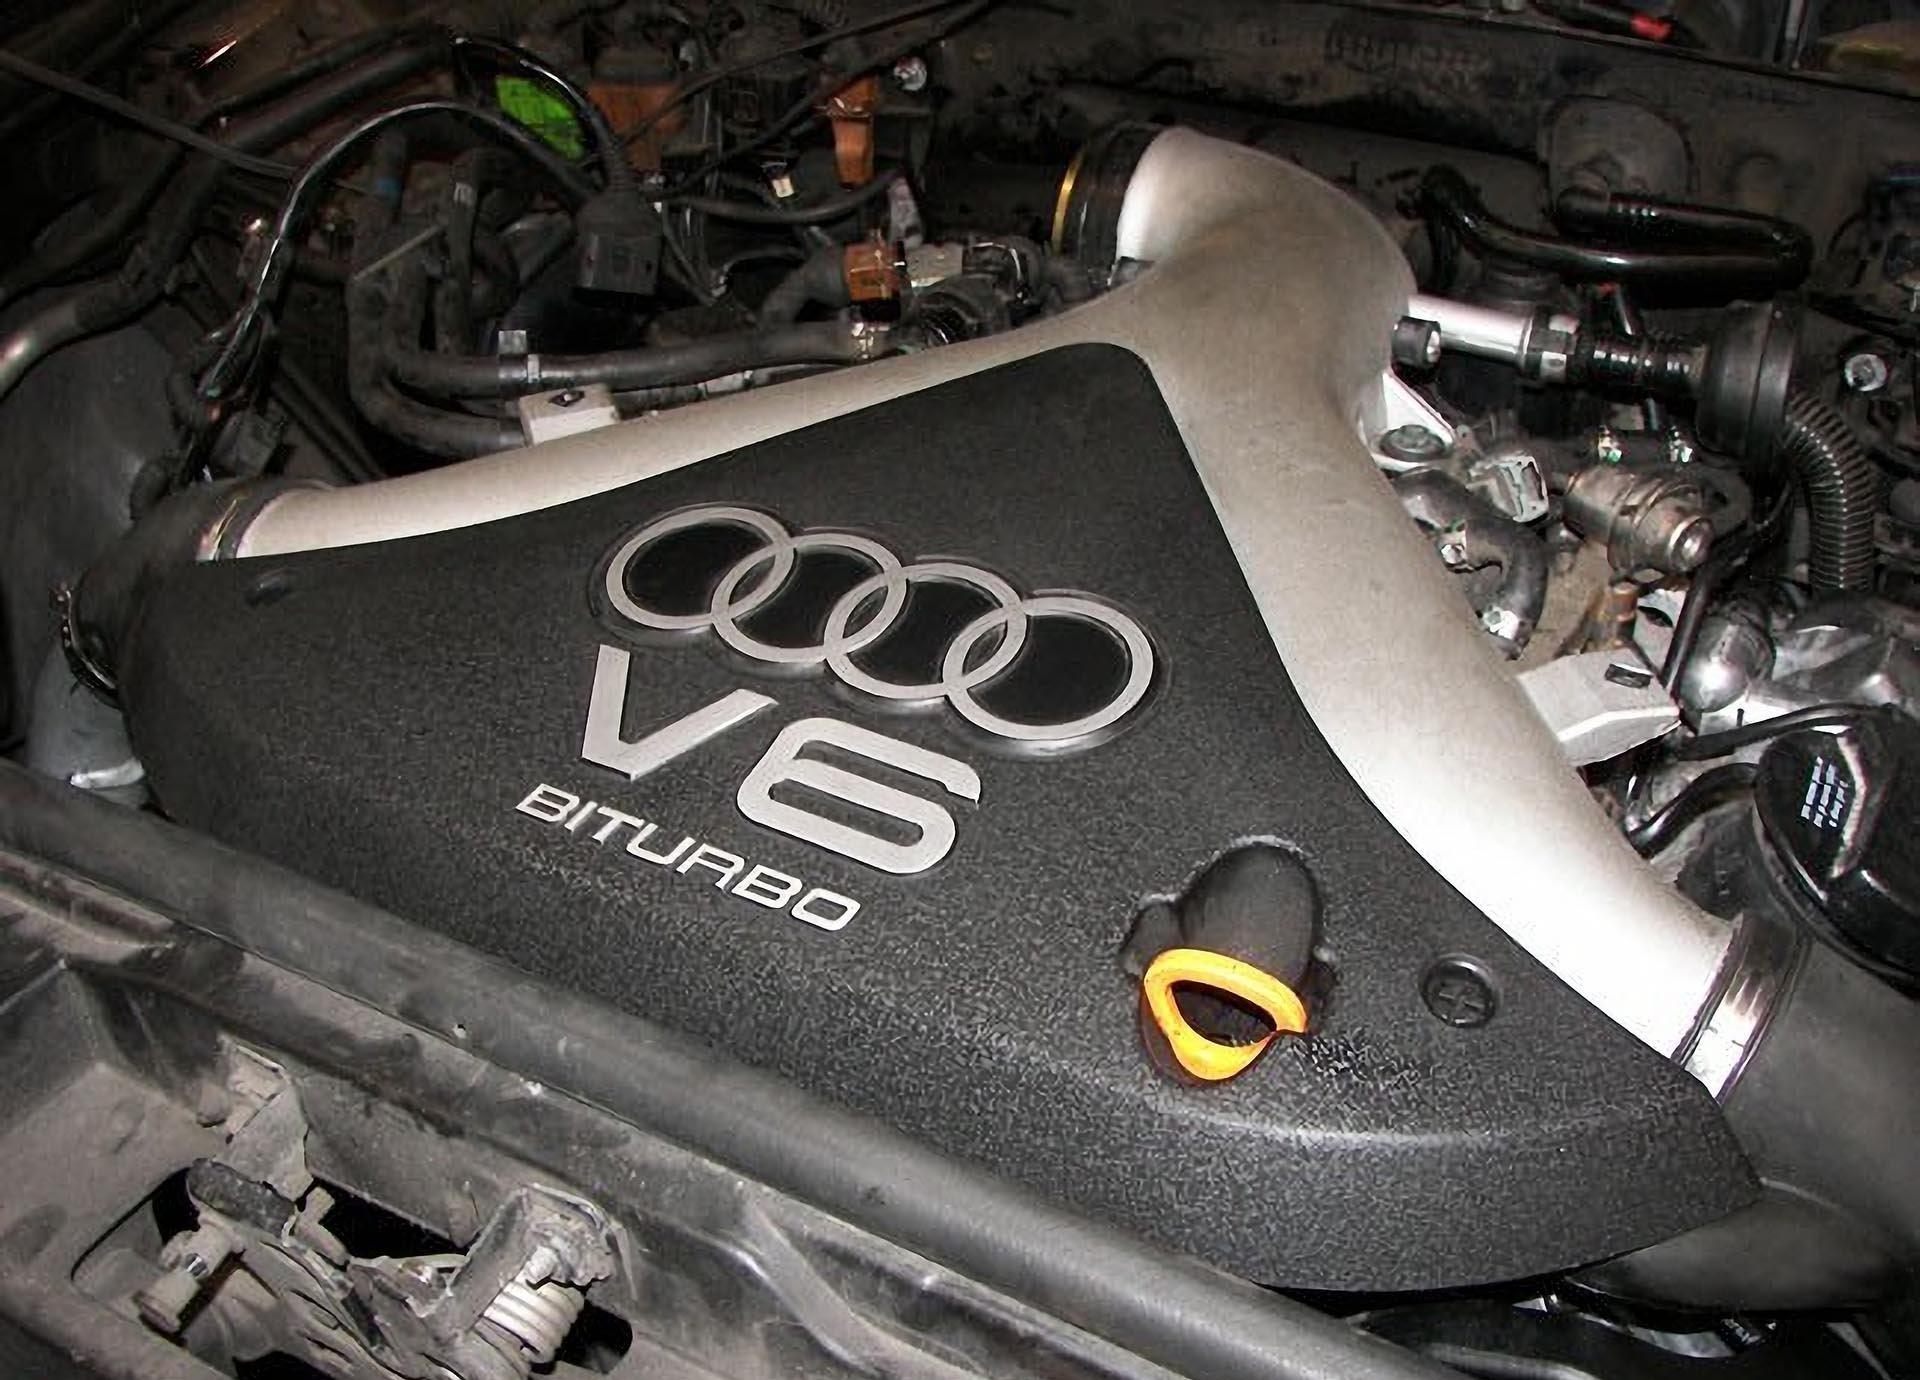 02_B5 Audi S4 2.7t engine bay